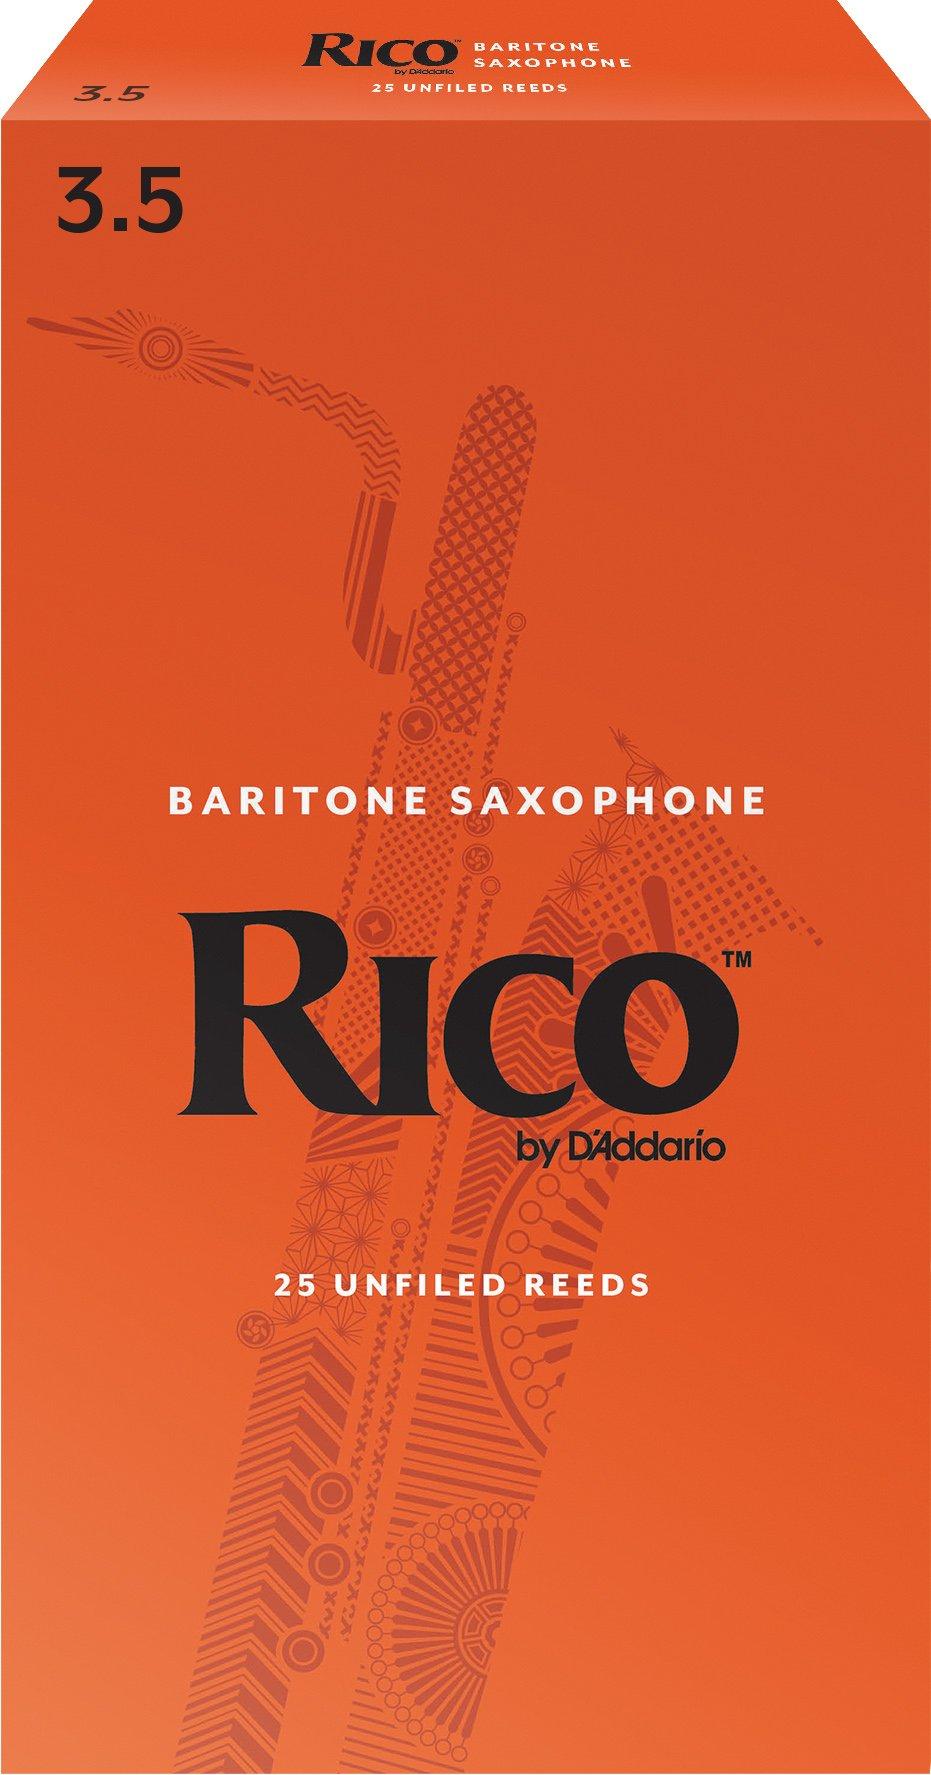 Rico by D'Addario Baritone Sax Reeds, Strength 3.5, 25-pack